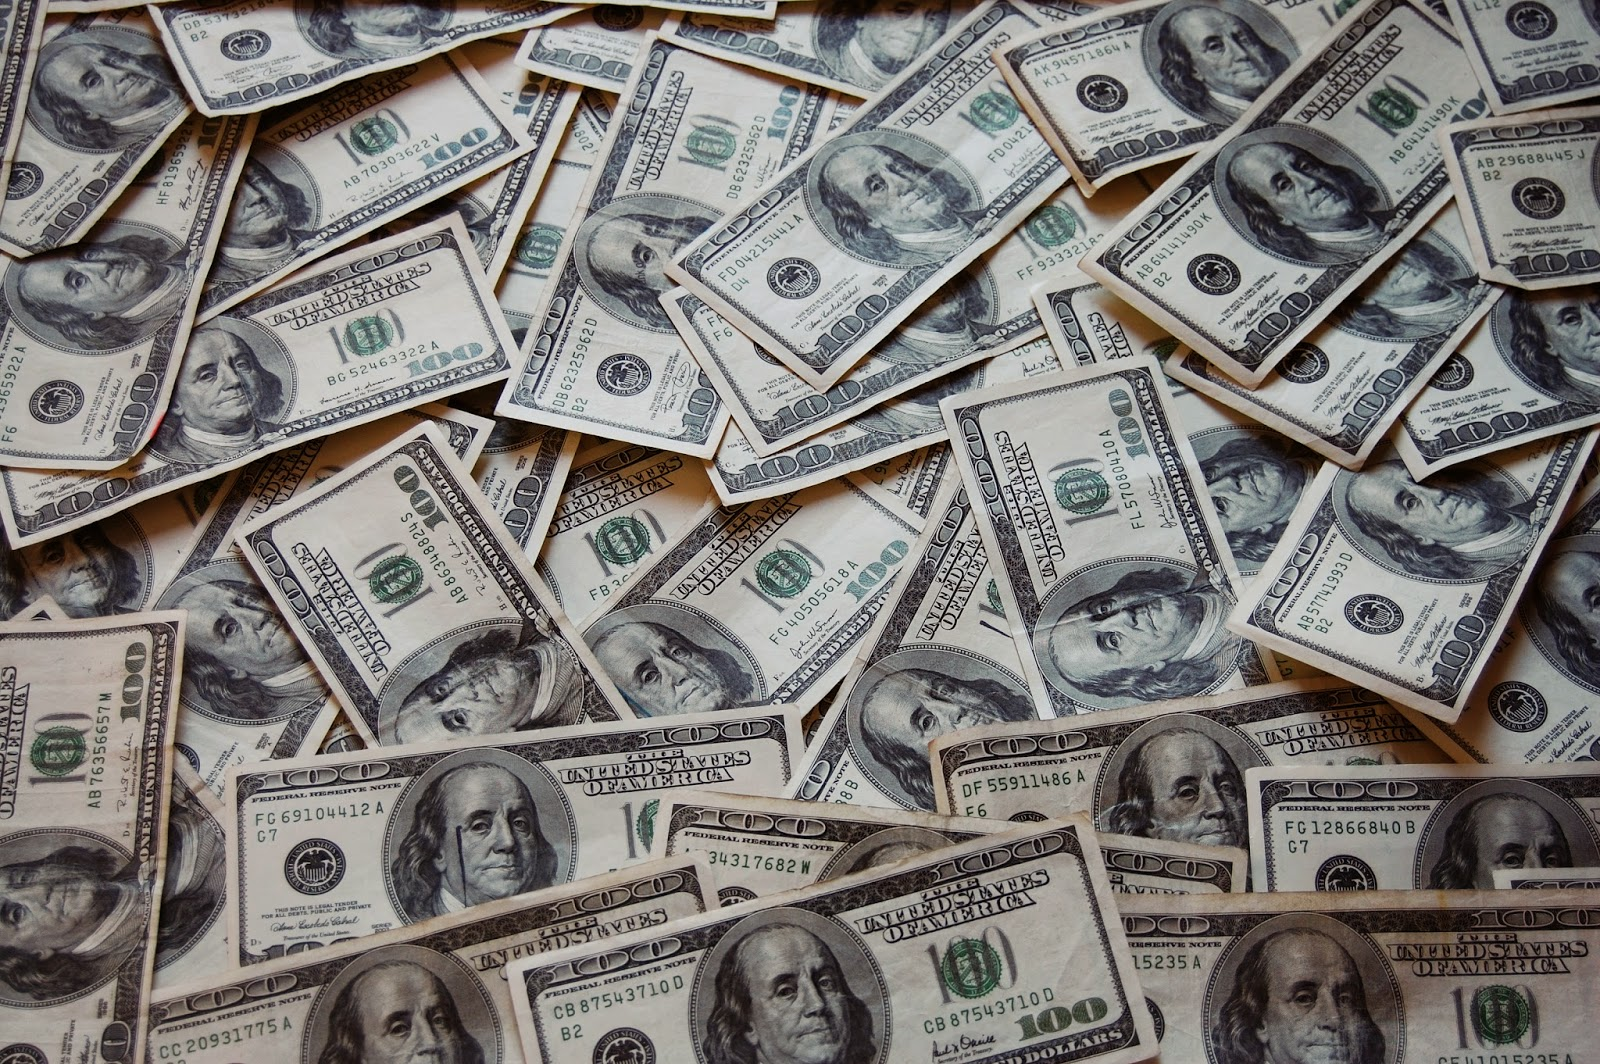 Benarkah bisnis online bisa jadi kaya raya